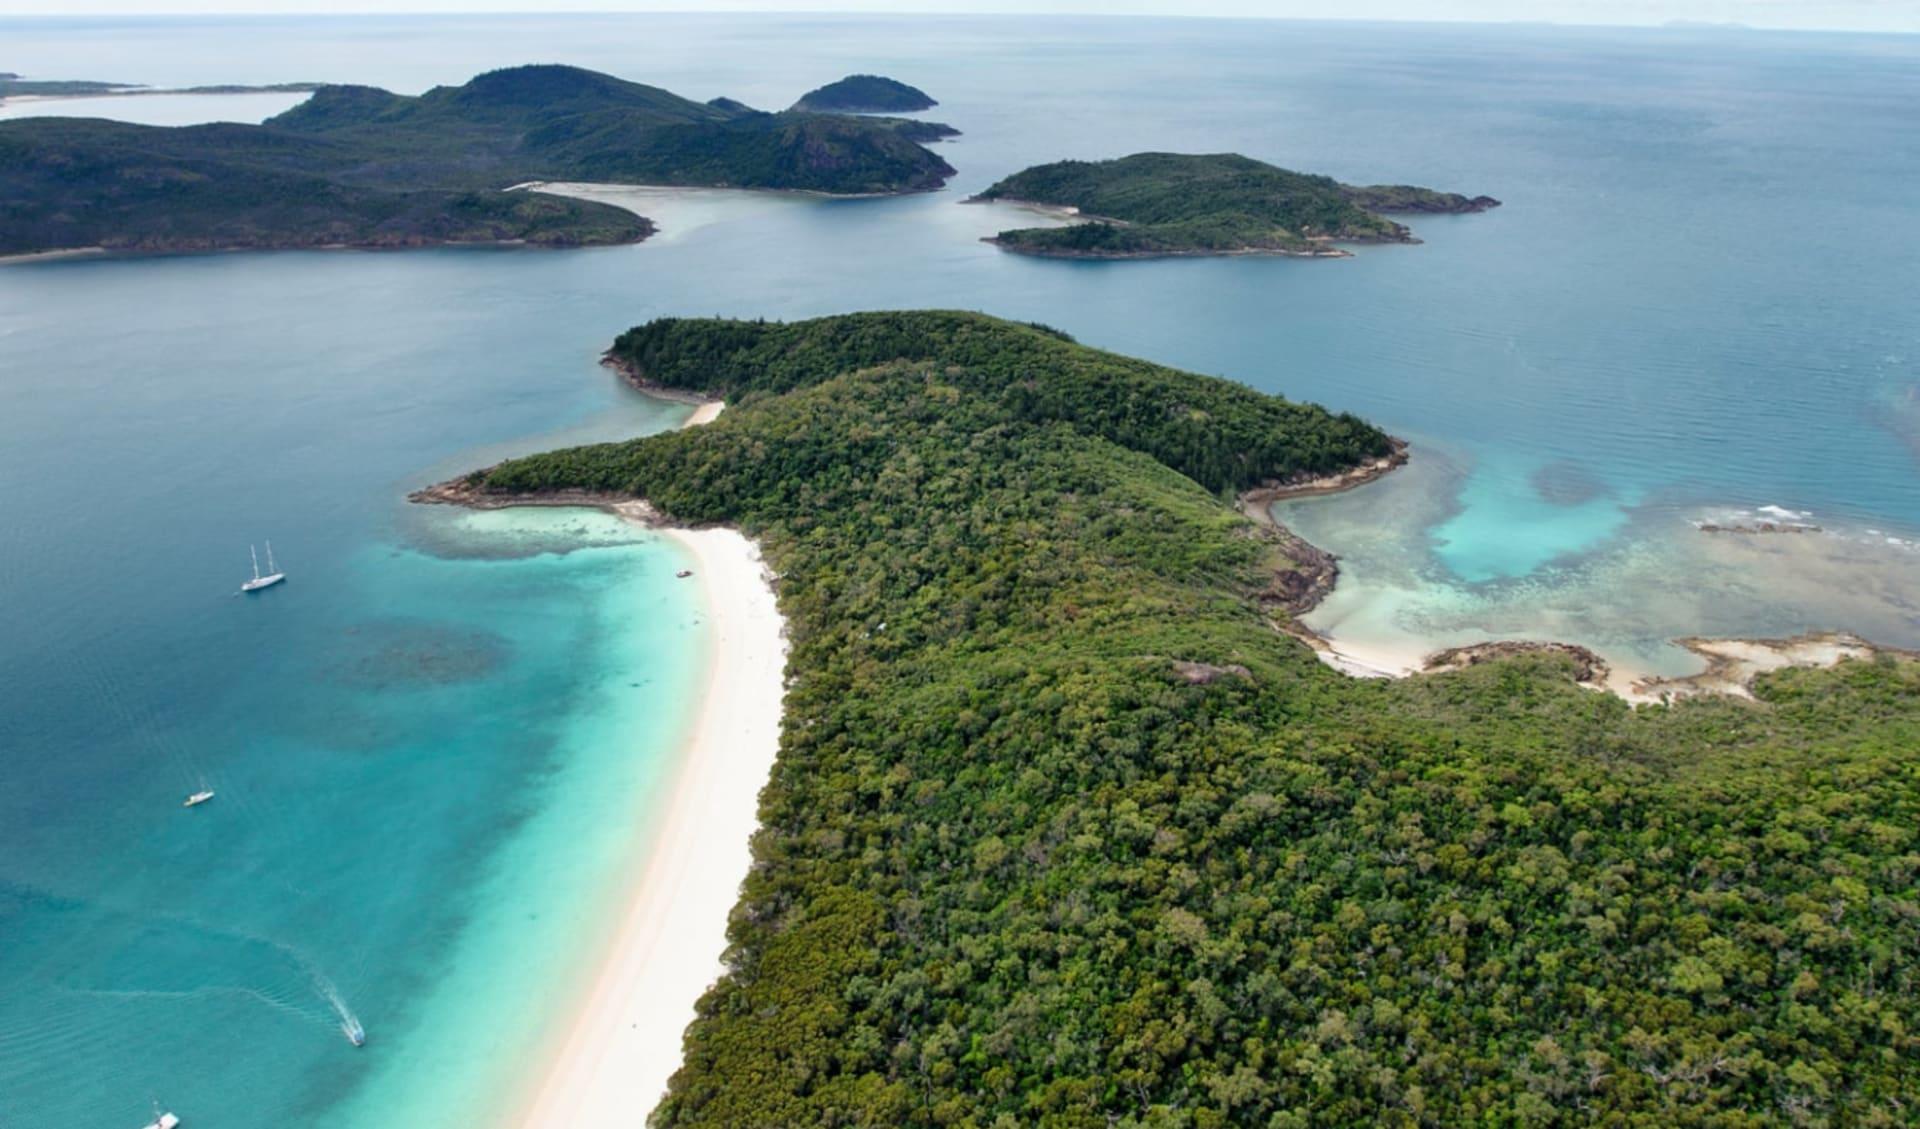 Kiana - Island, Reef & Dive ab Airlie Beach: Australia - Queensland - Whitsundays - Luftaufnahme